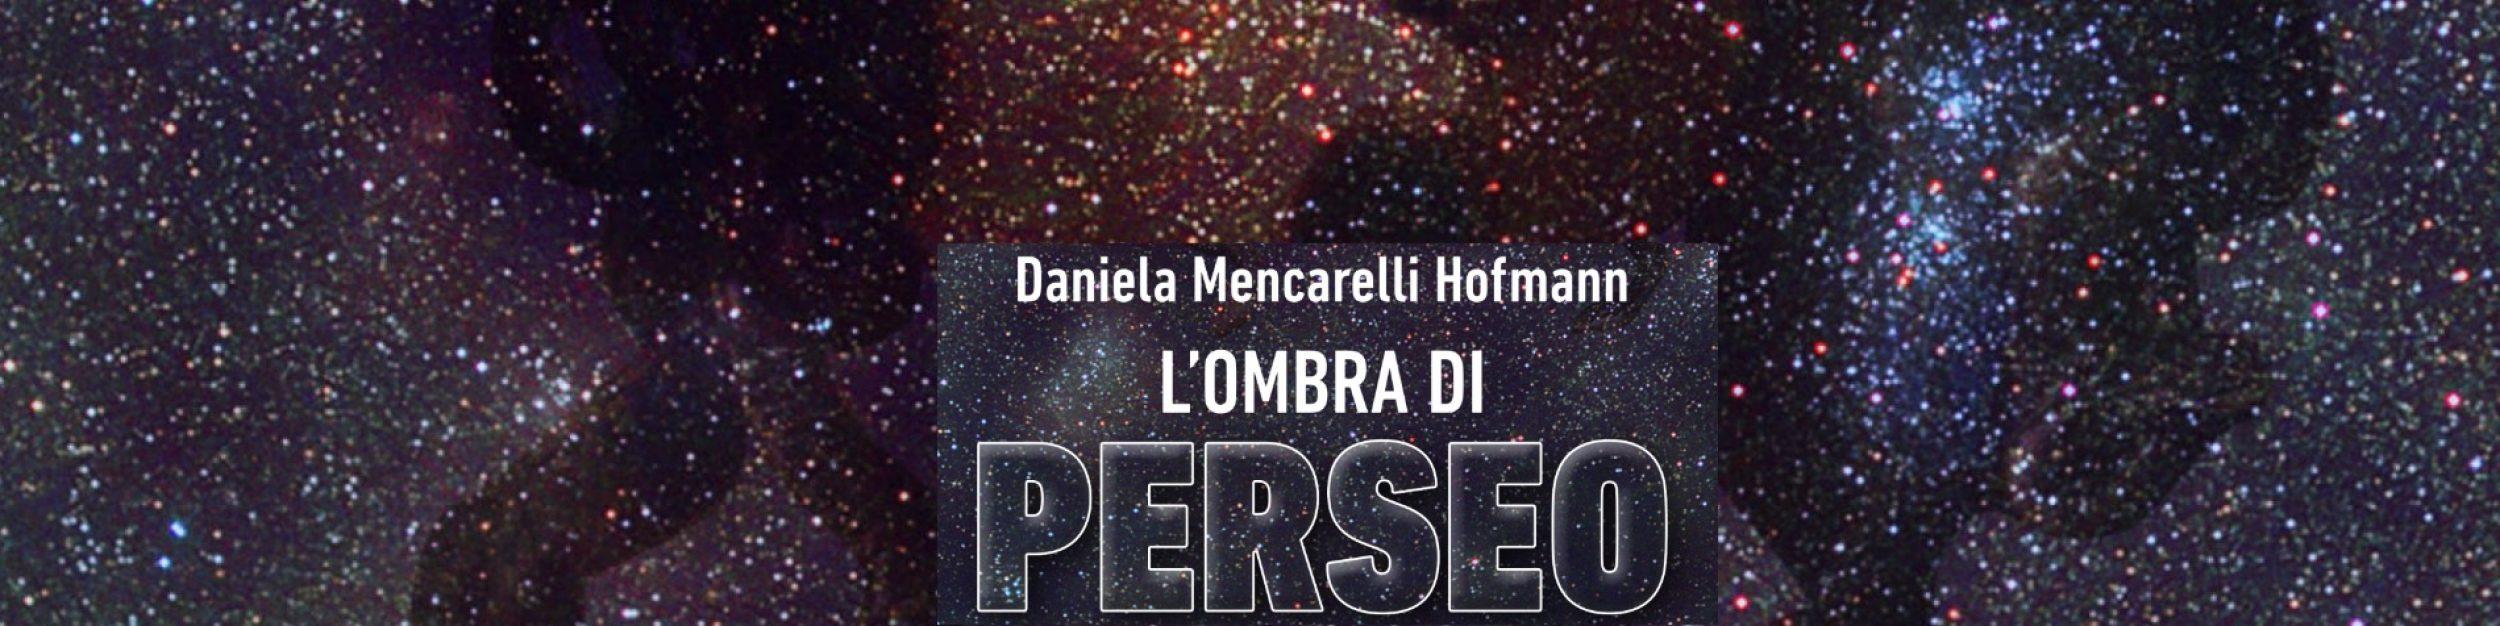 Daniela Mencarelli Hofmann autrice